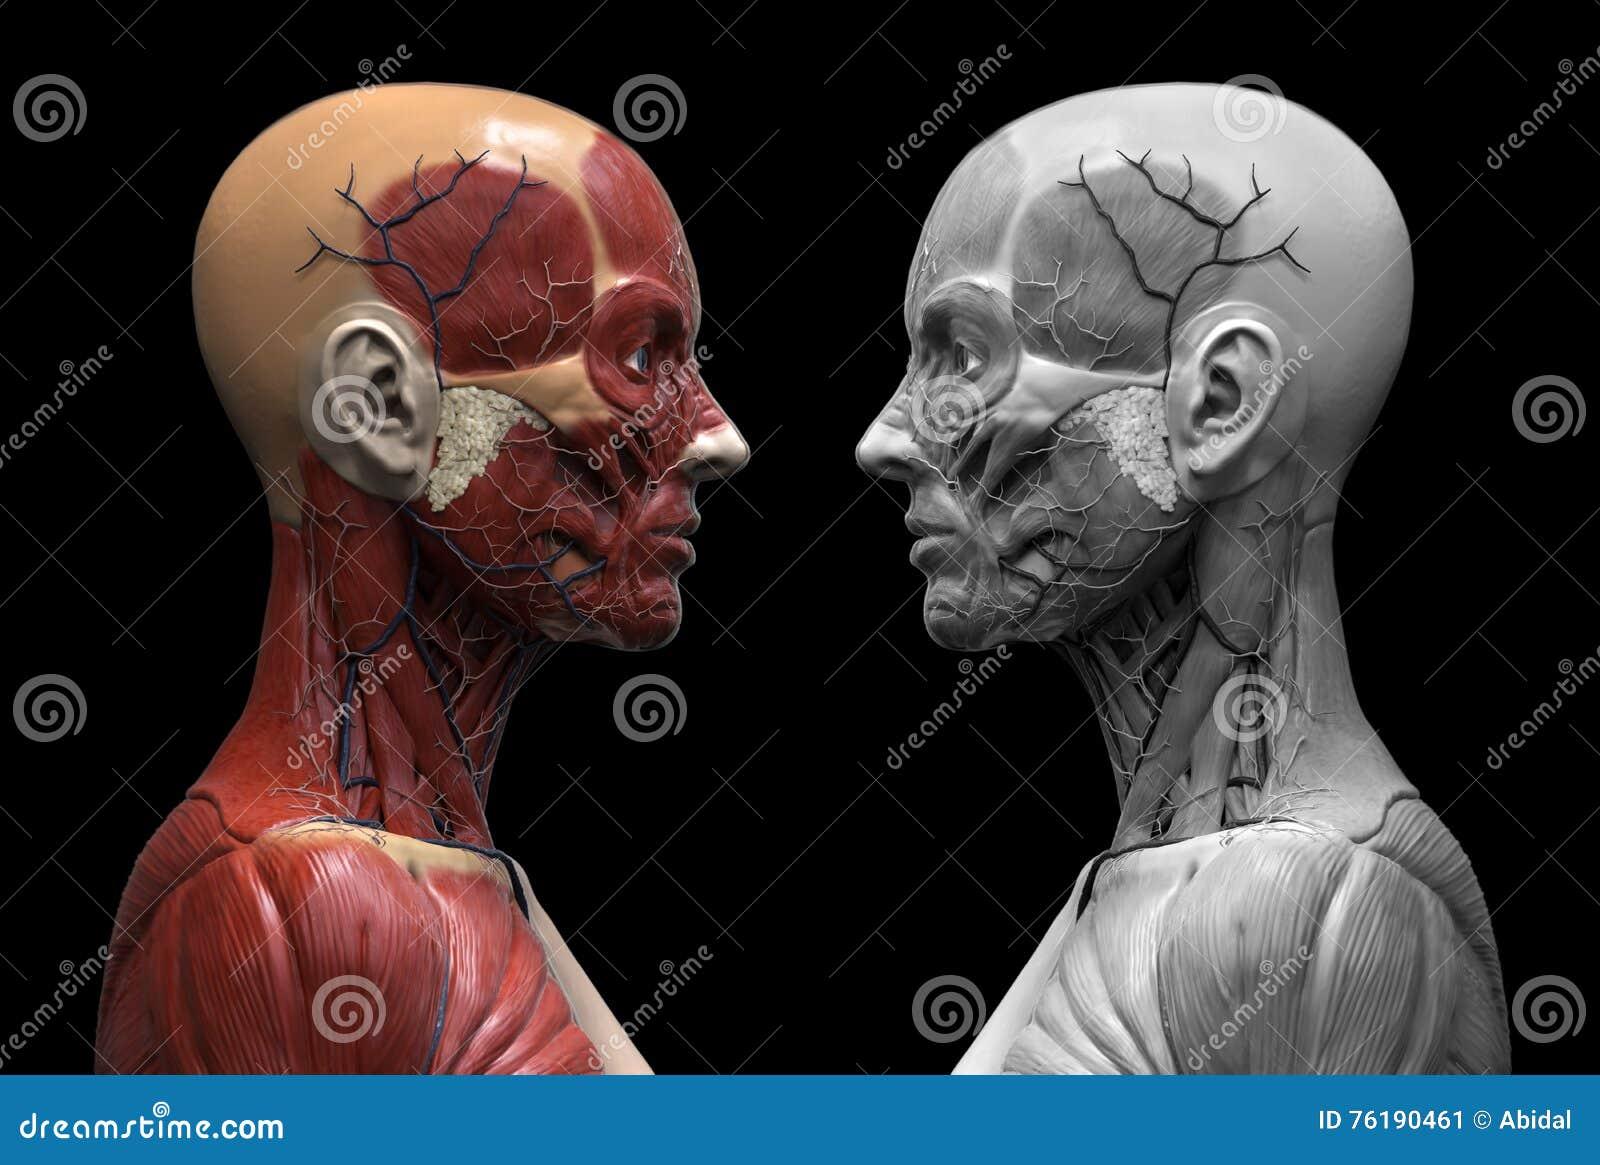 Realistic Human Body Organ Diagram Not Lossing Wiring Diagram